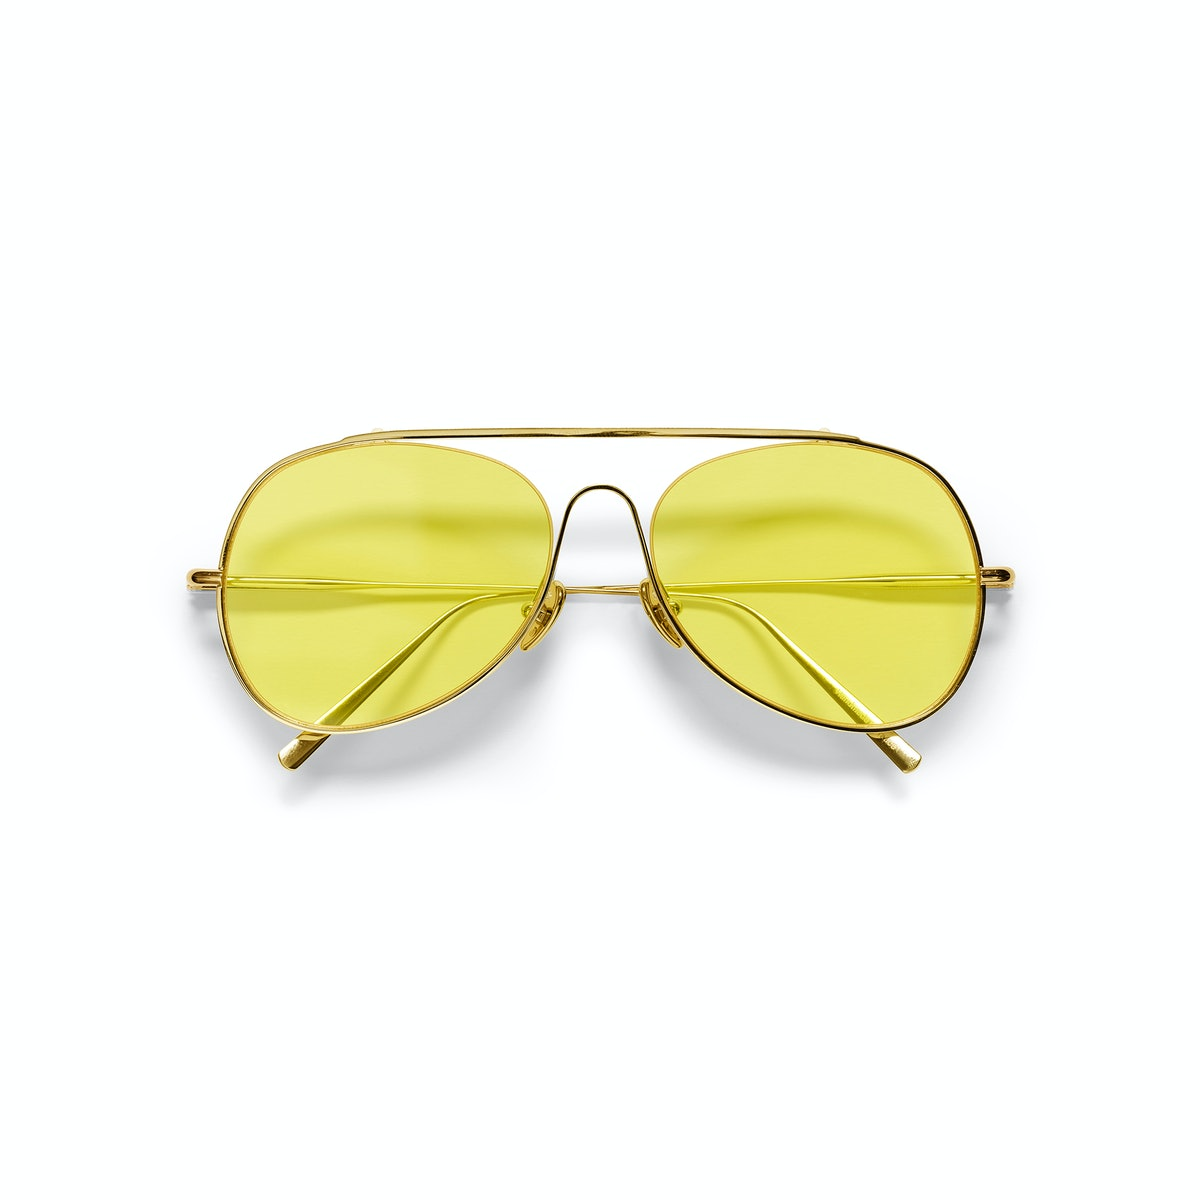 Yellow Acne Studios sunglasses